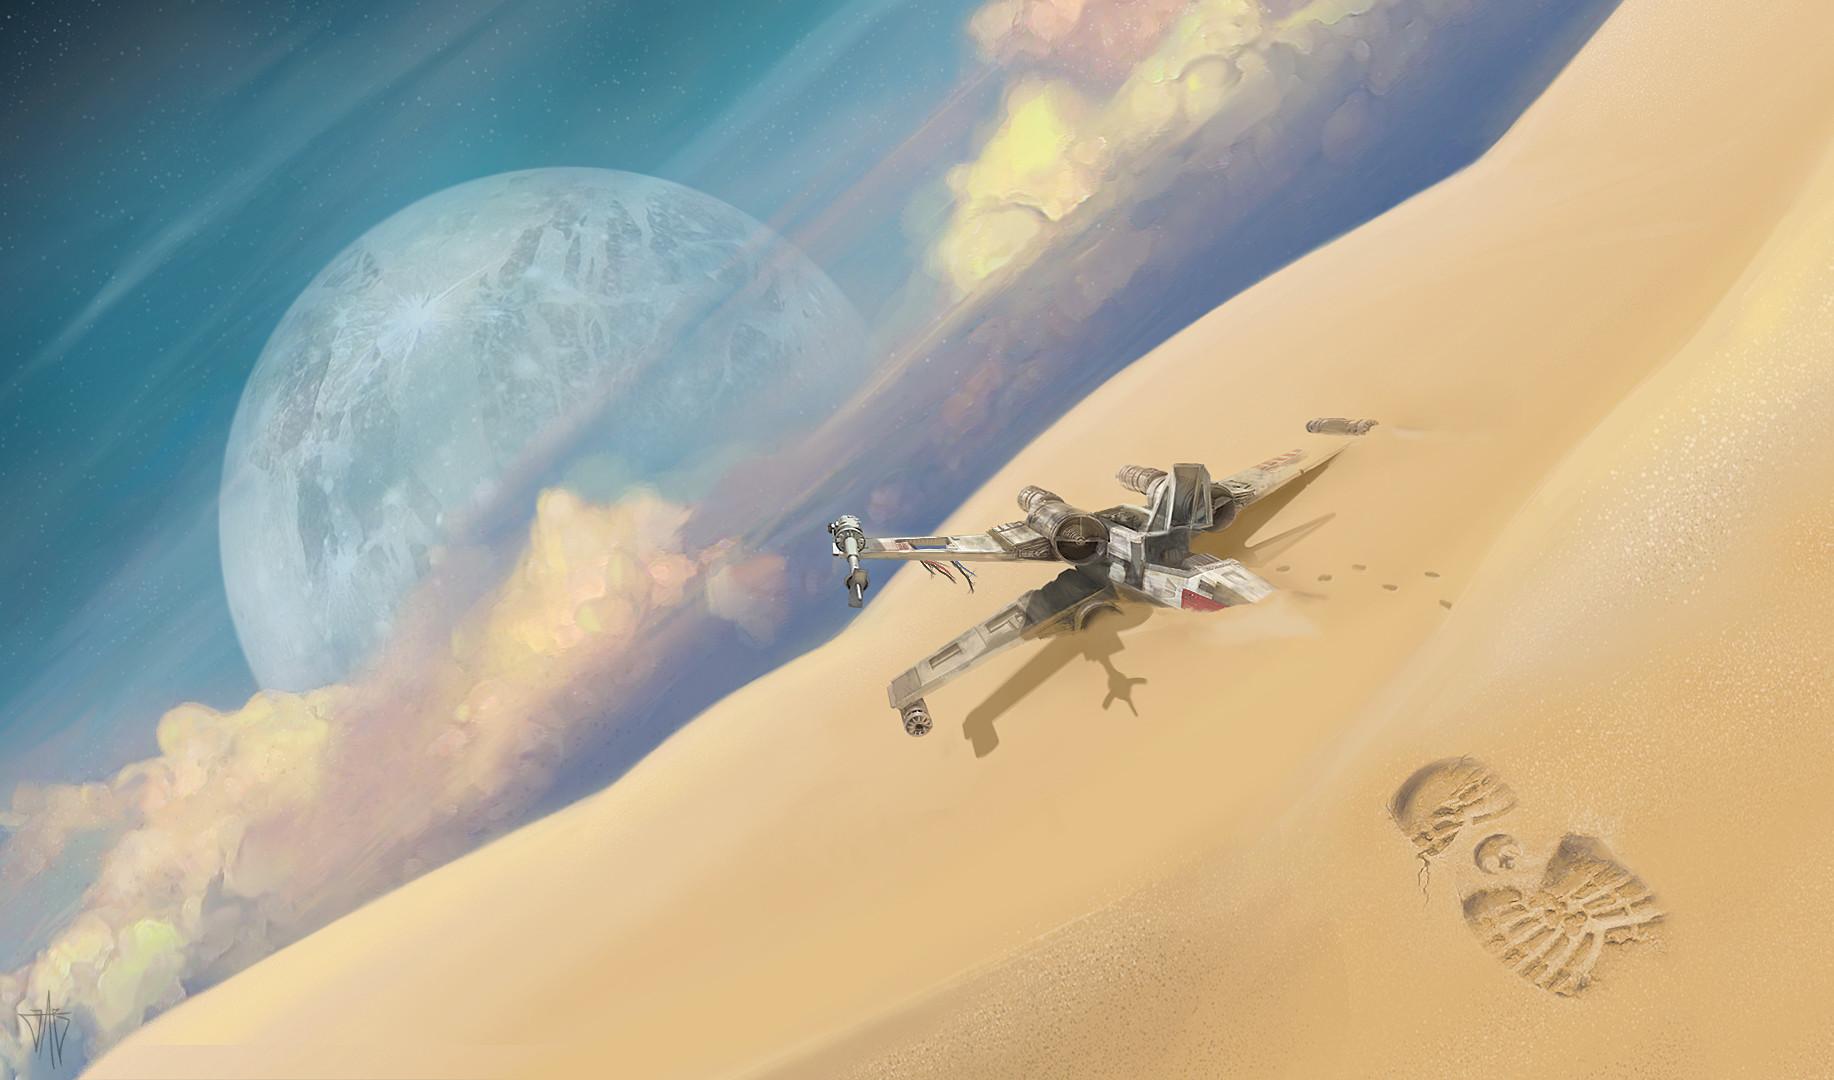 jakob-alexander-brahm-desertplanet.jpg?1